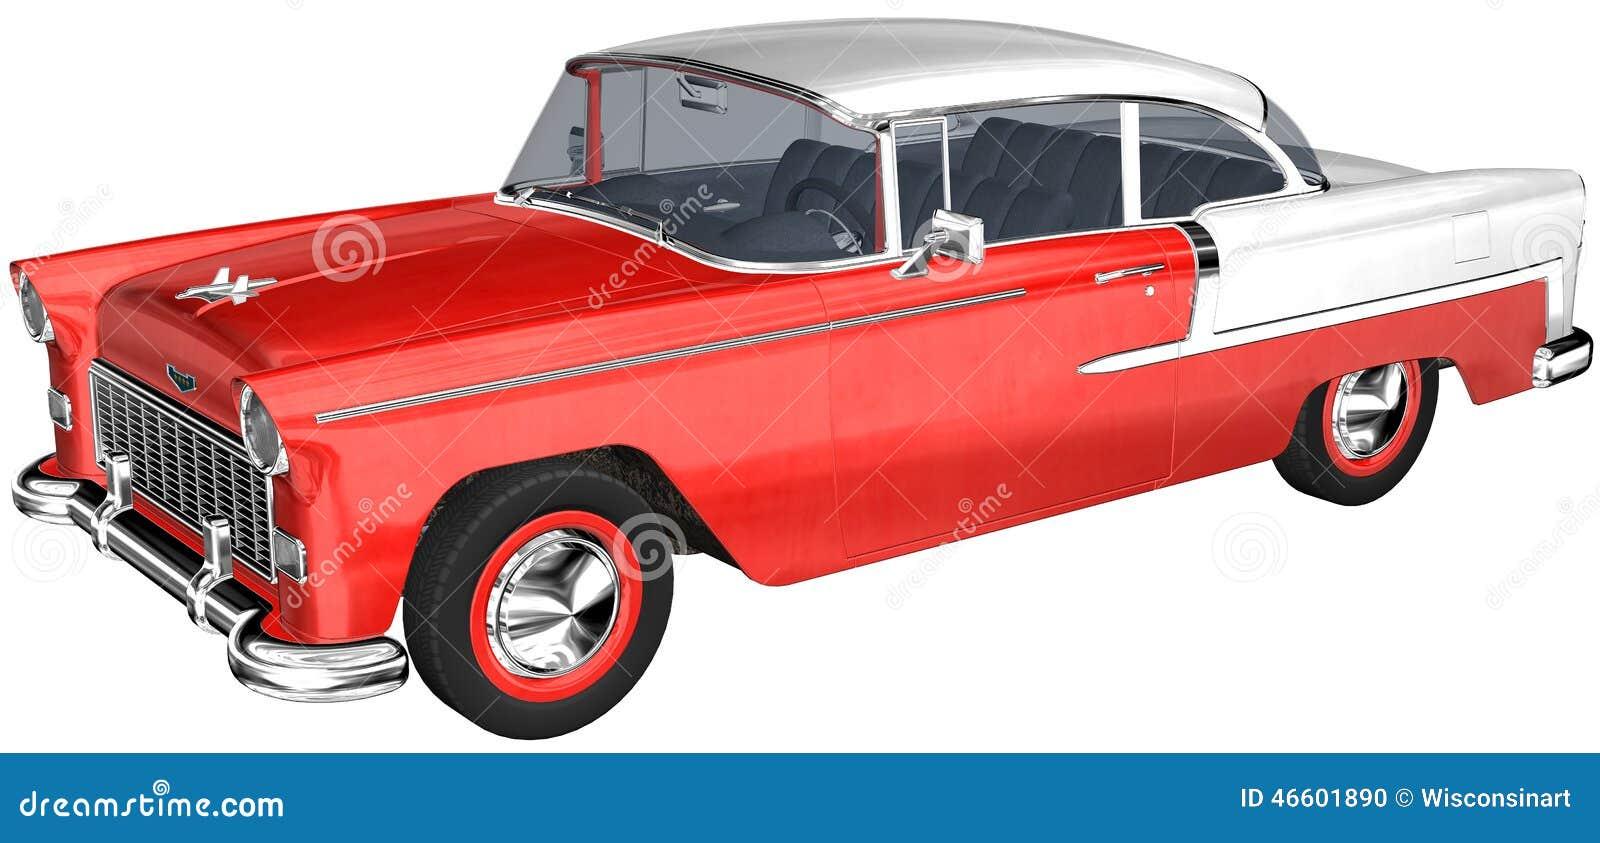 Retro Classic Car Illustration Isolated Stock Illustration Image